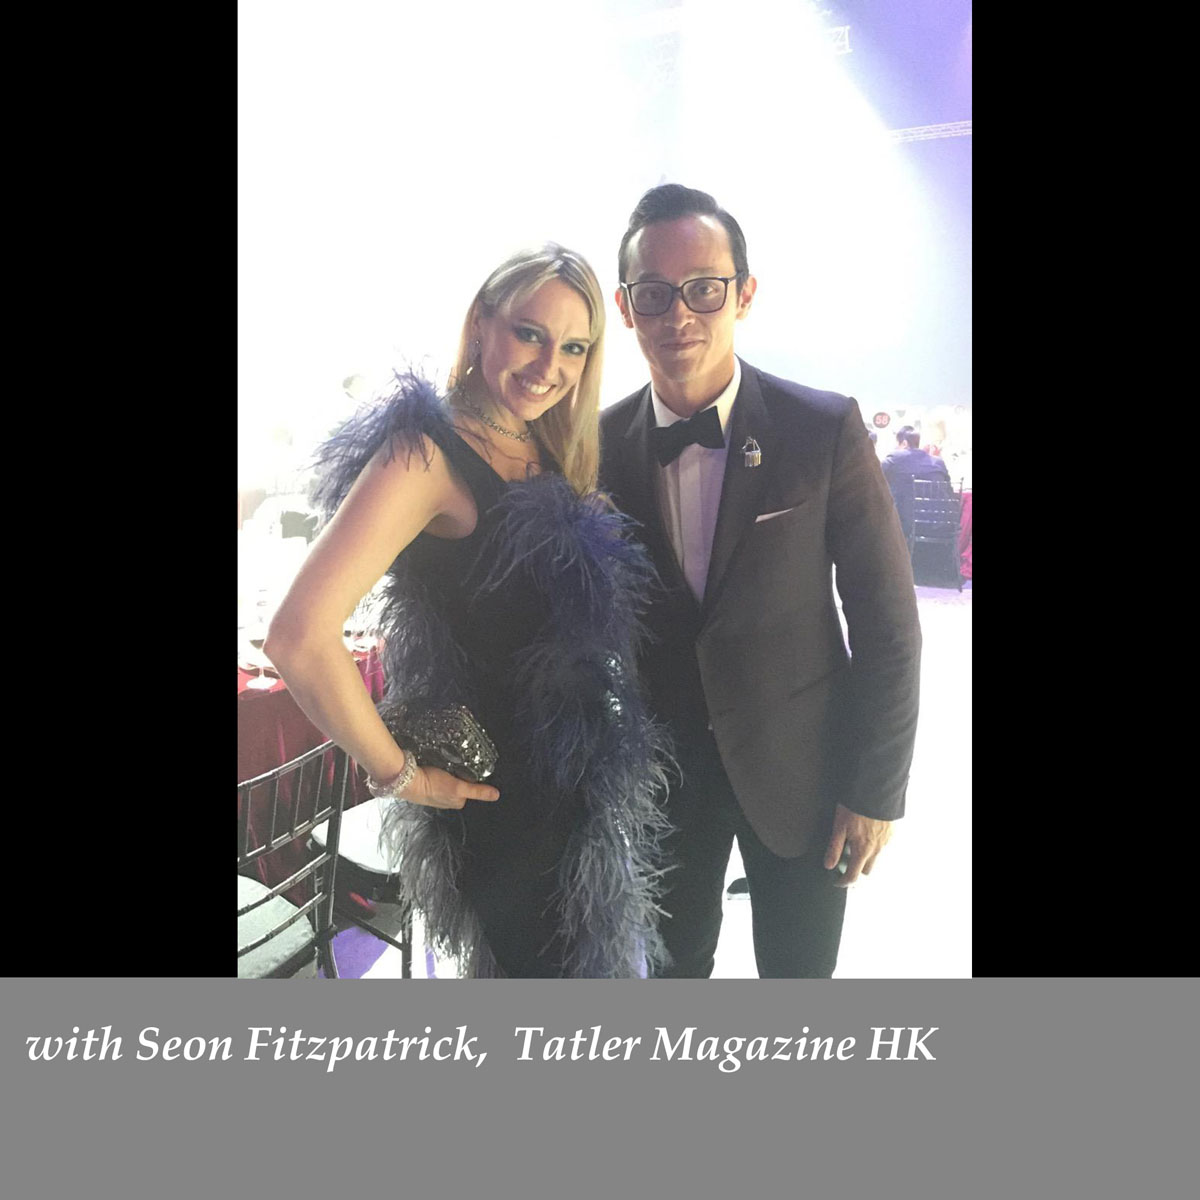 with-Seon-Fitzpatrick-Tatler-Magazine-HK